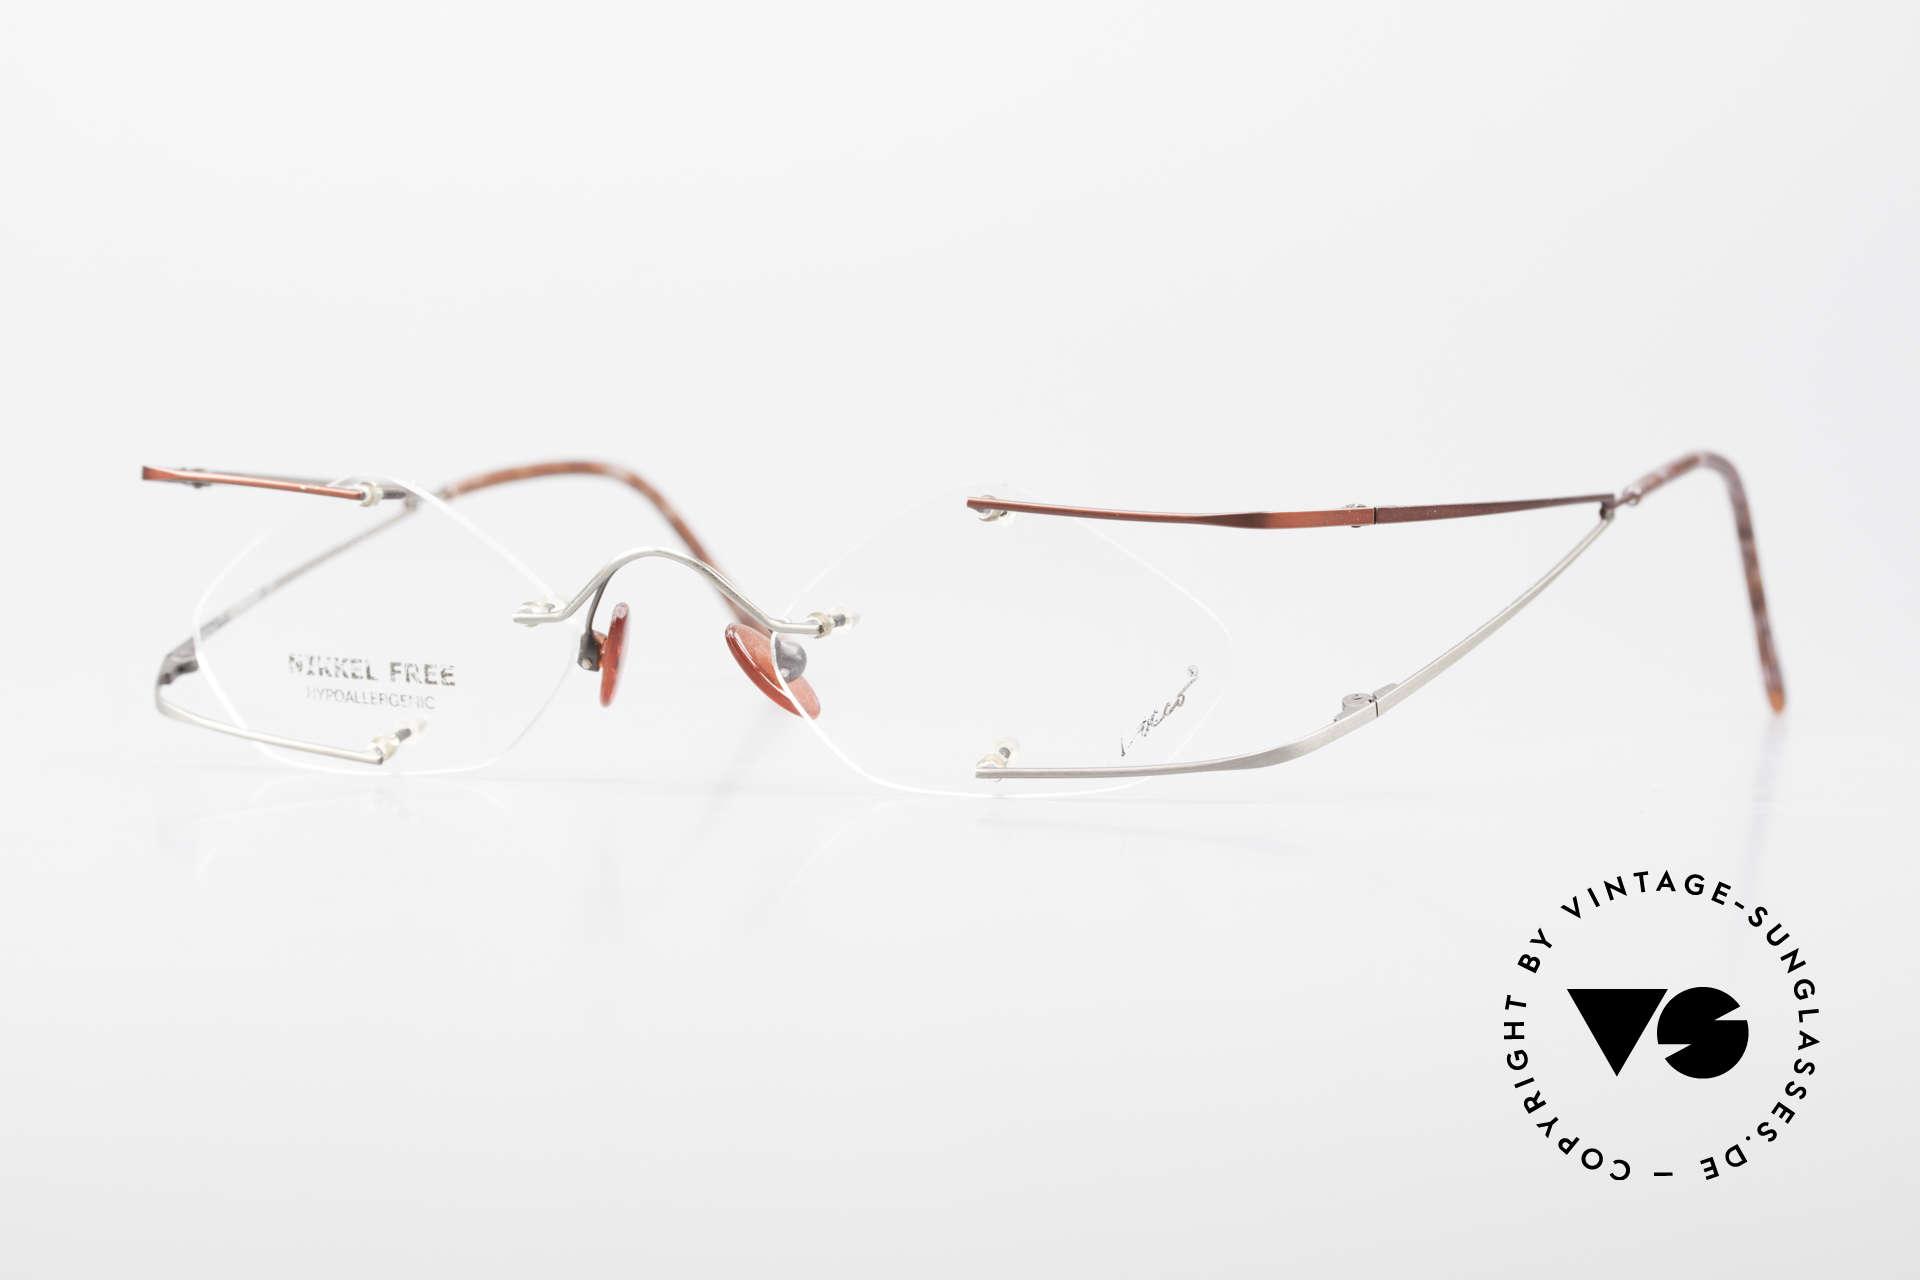 Locco Stars C Extraordinary Rimless Frame, Locco Stars 44-20, crazy rimless 1990's eyeglasses, Made for Men and Women